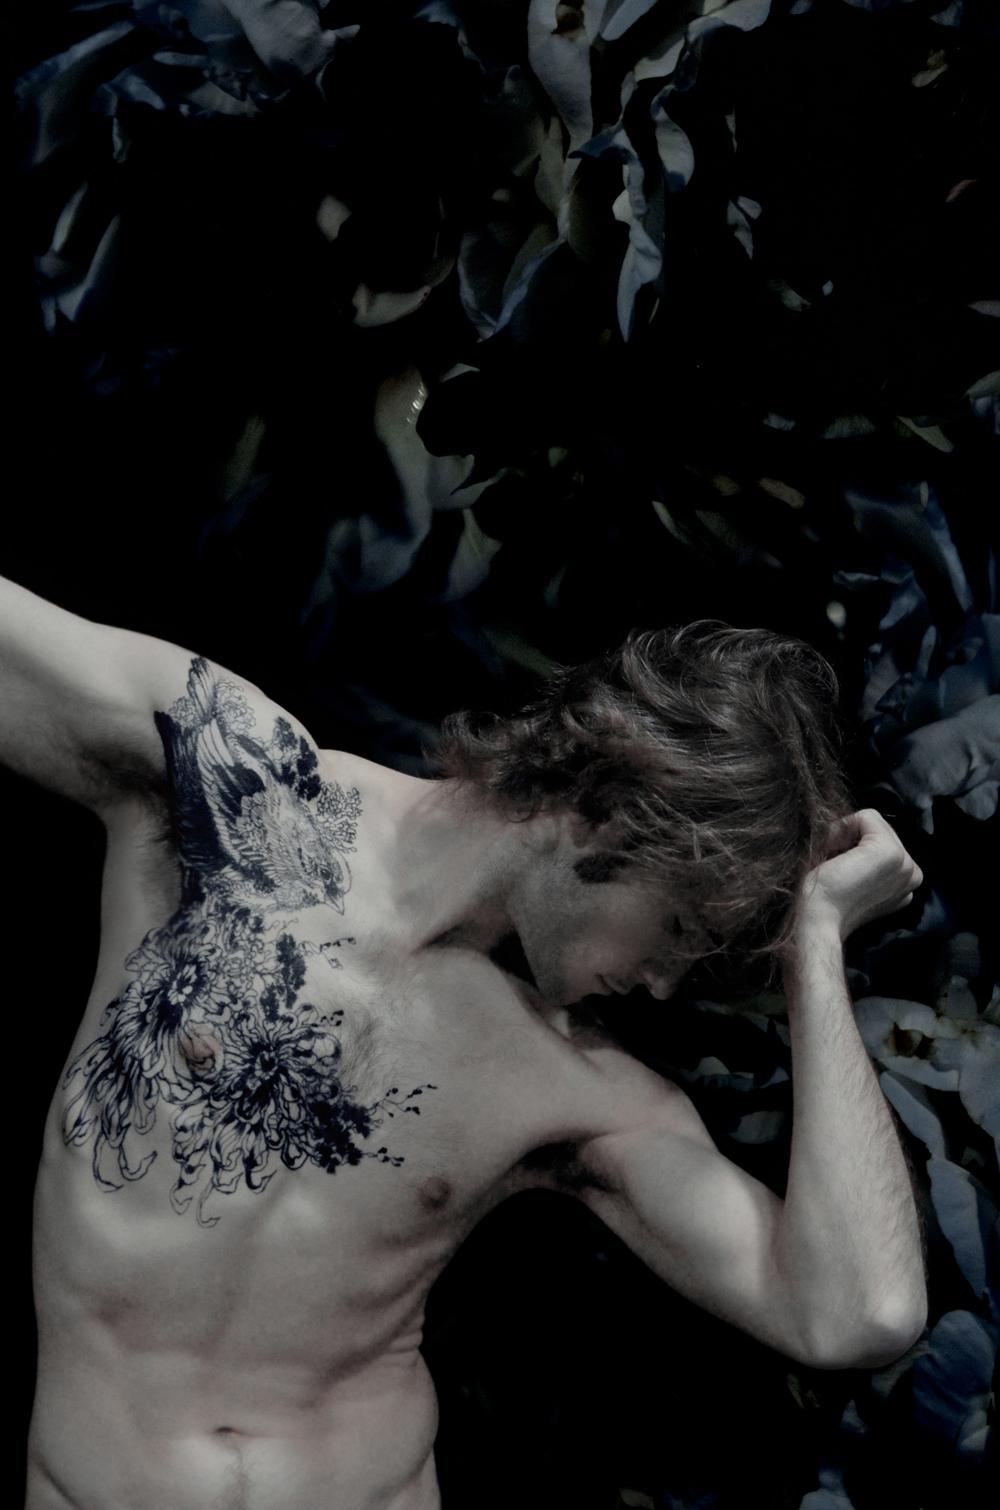 RHAPSODY OF A DANCER